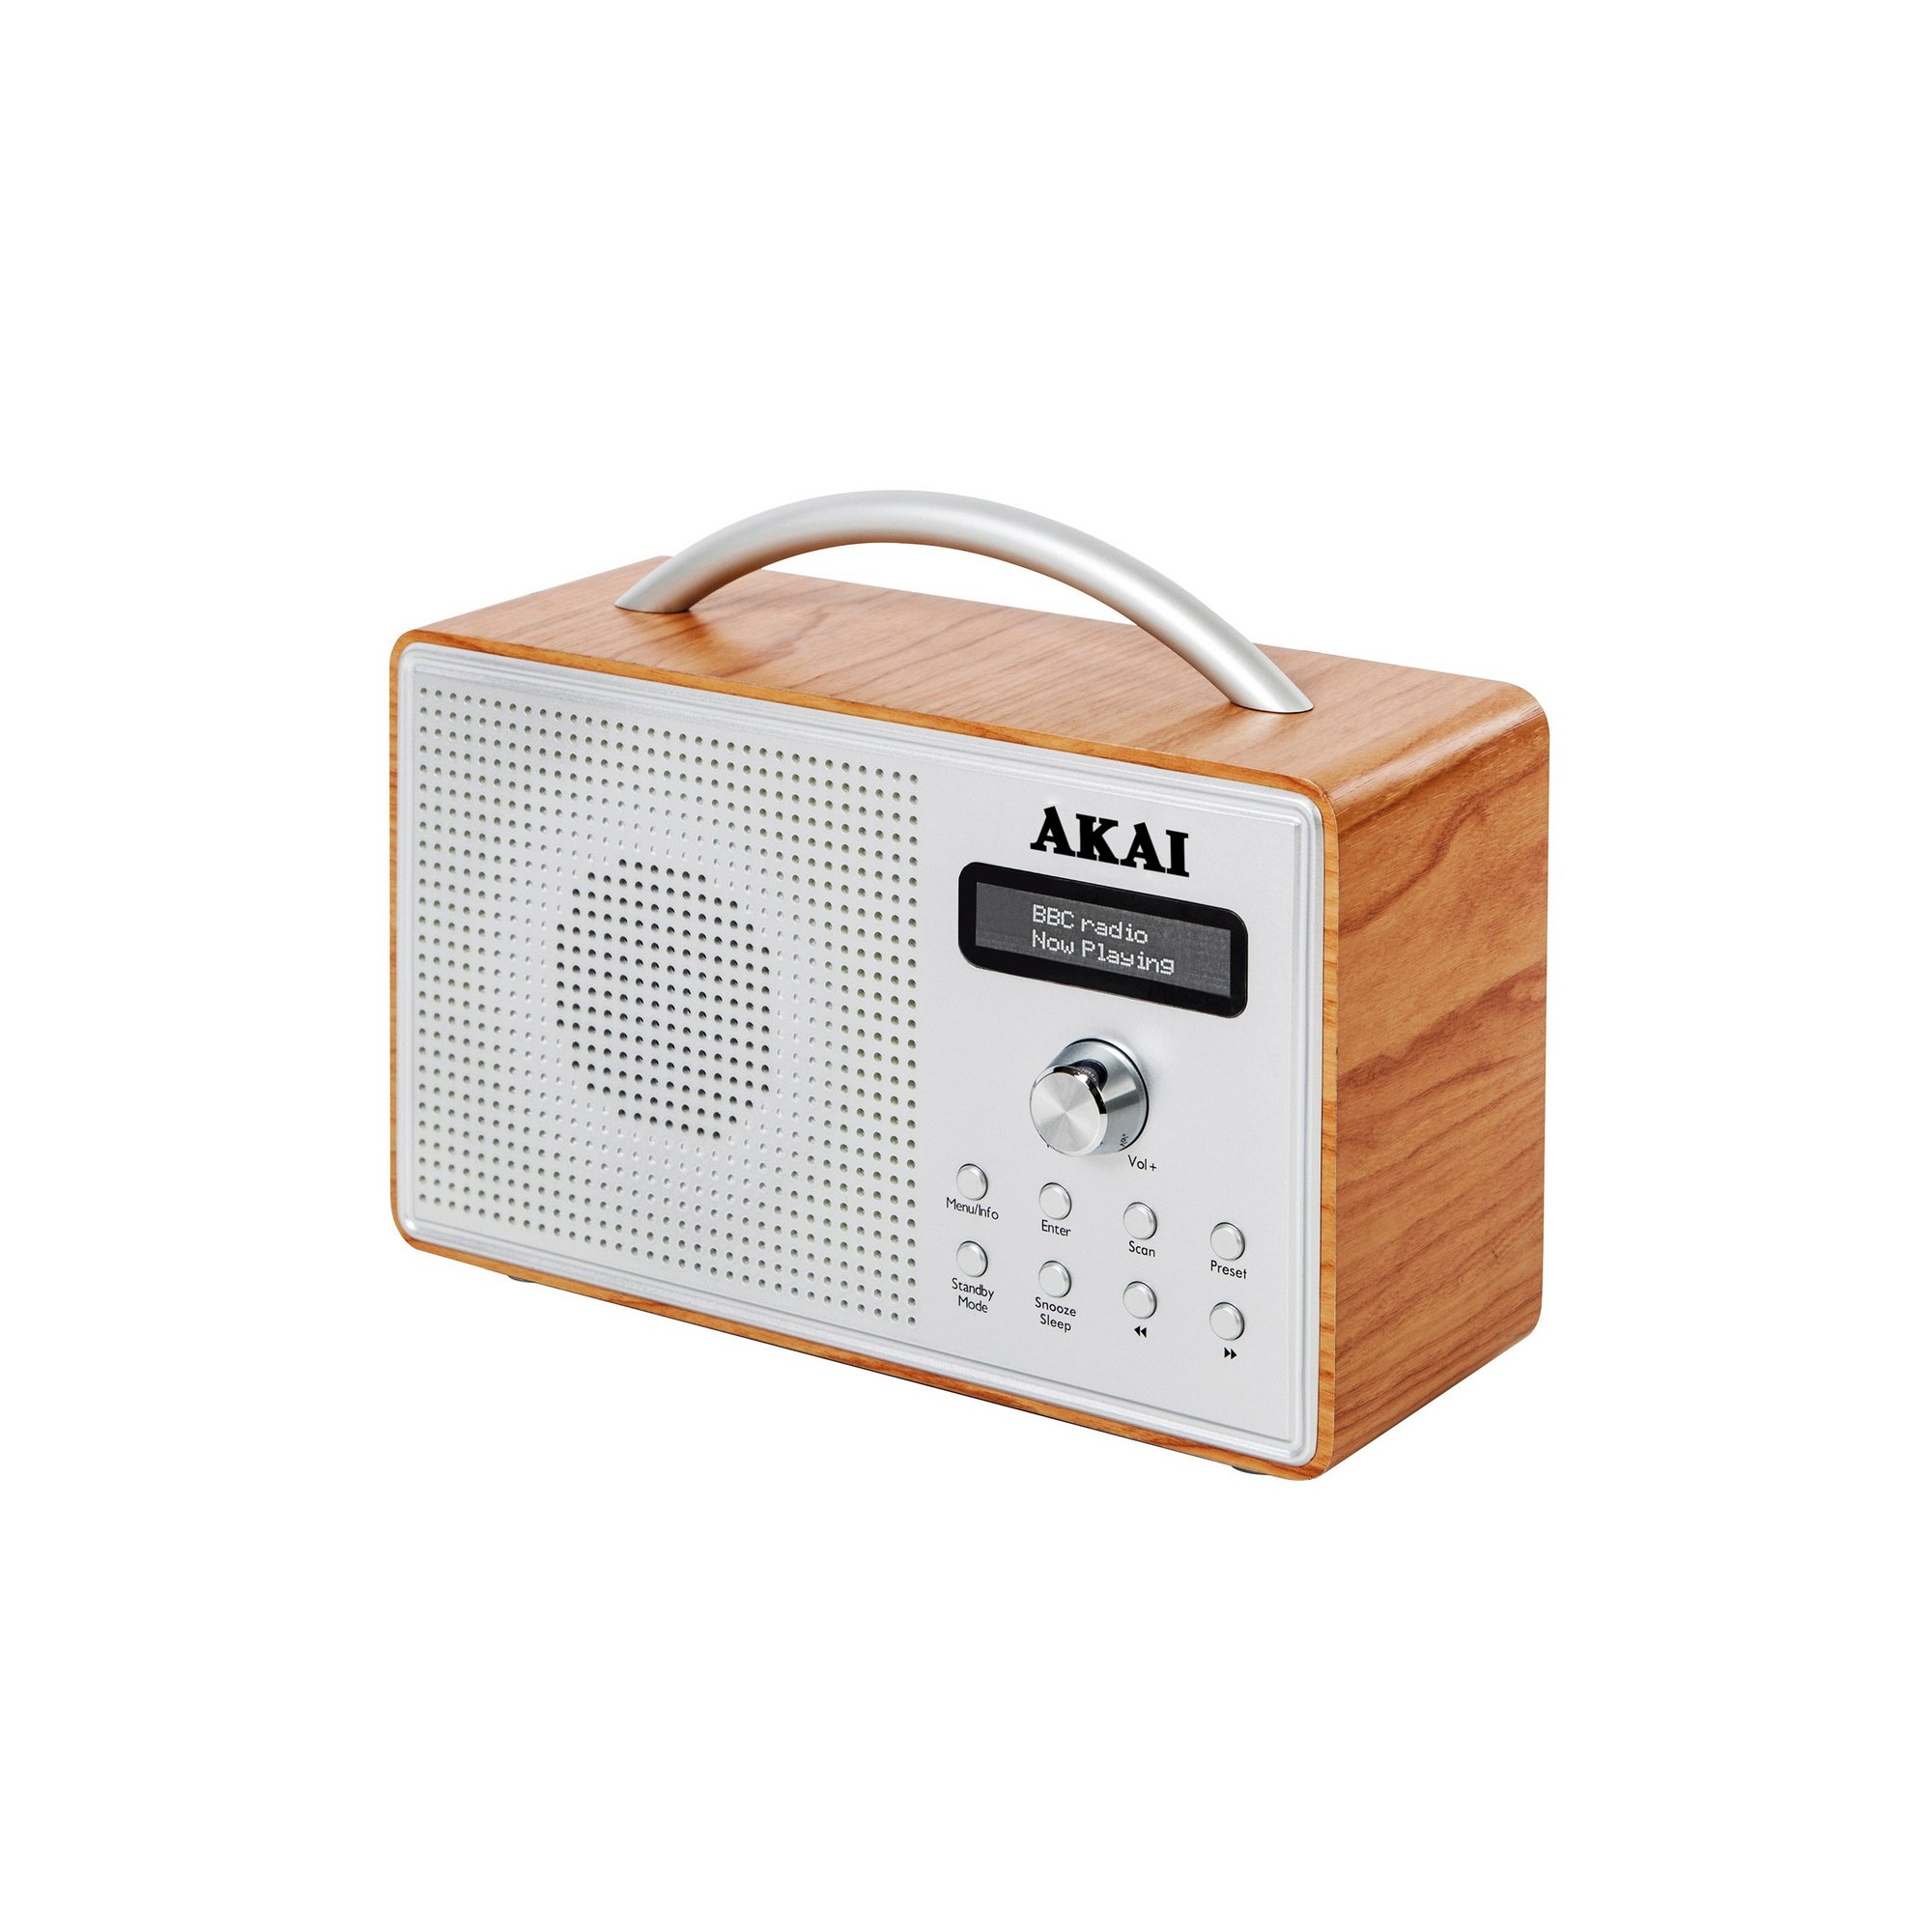 Image of Akai Core Mono DAB Plus FM Radio